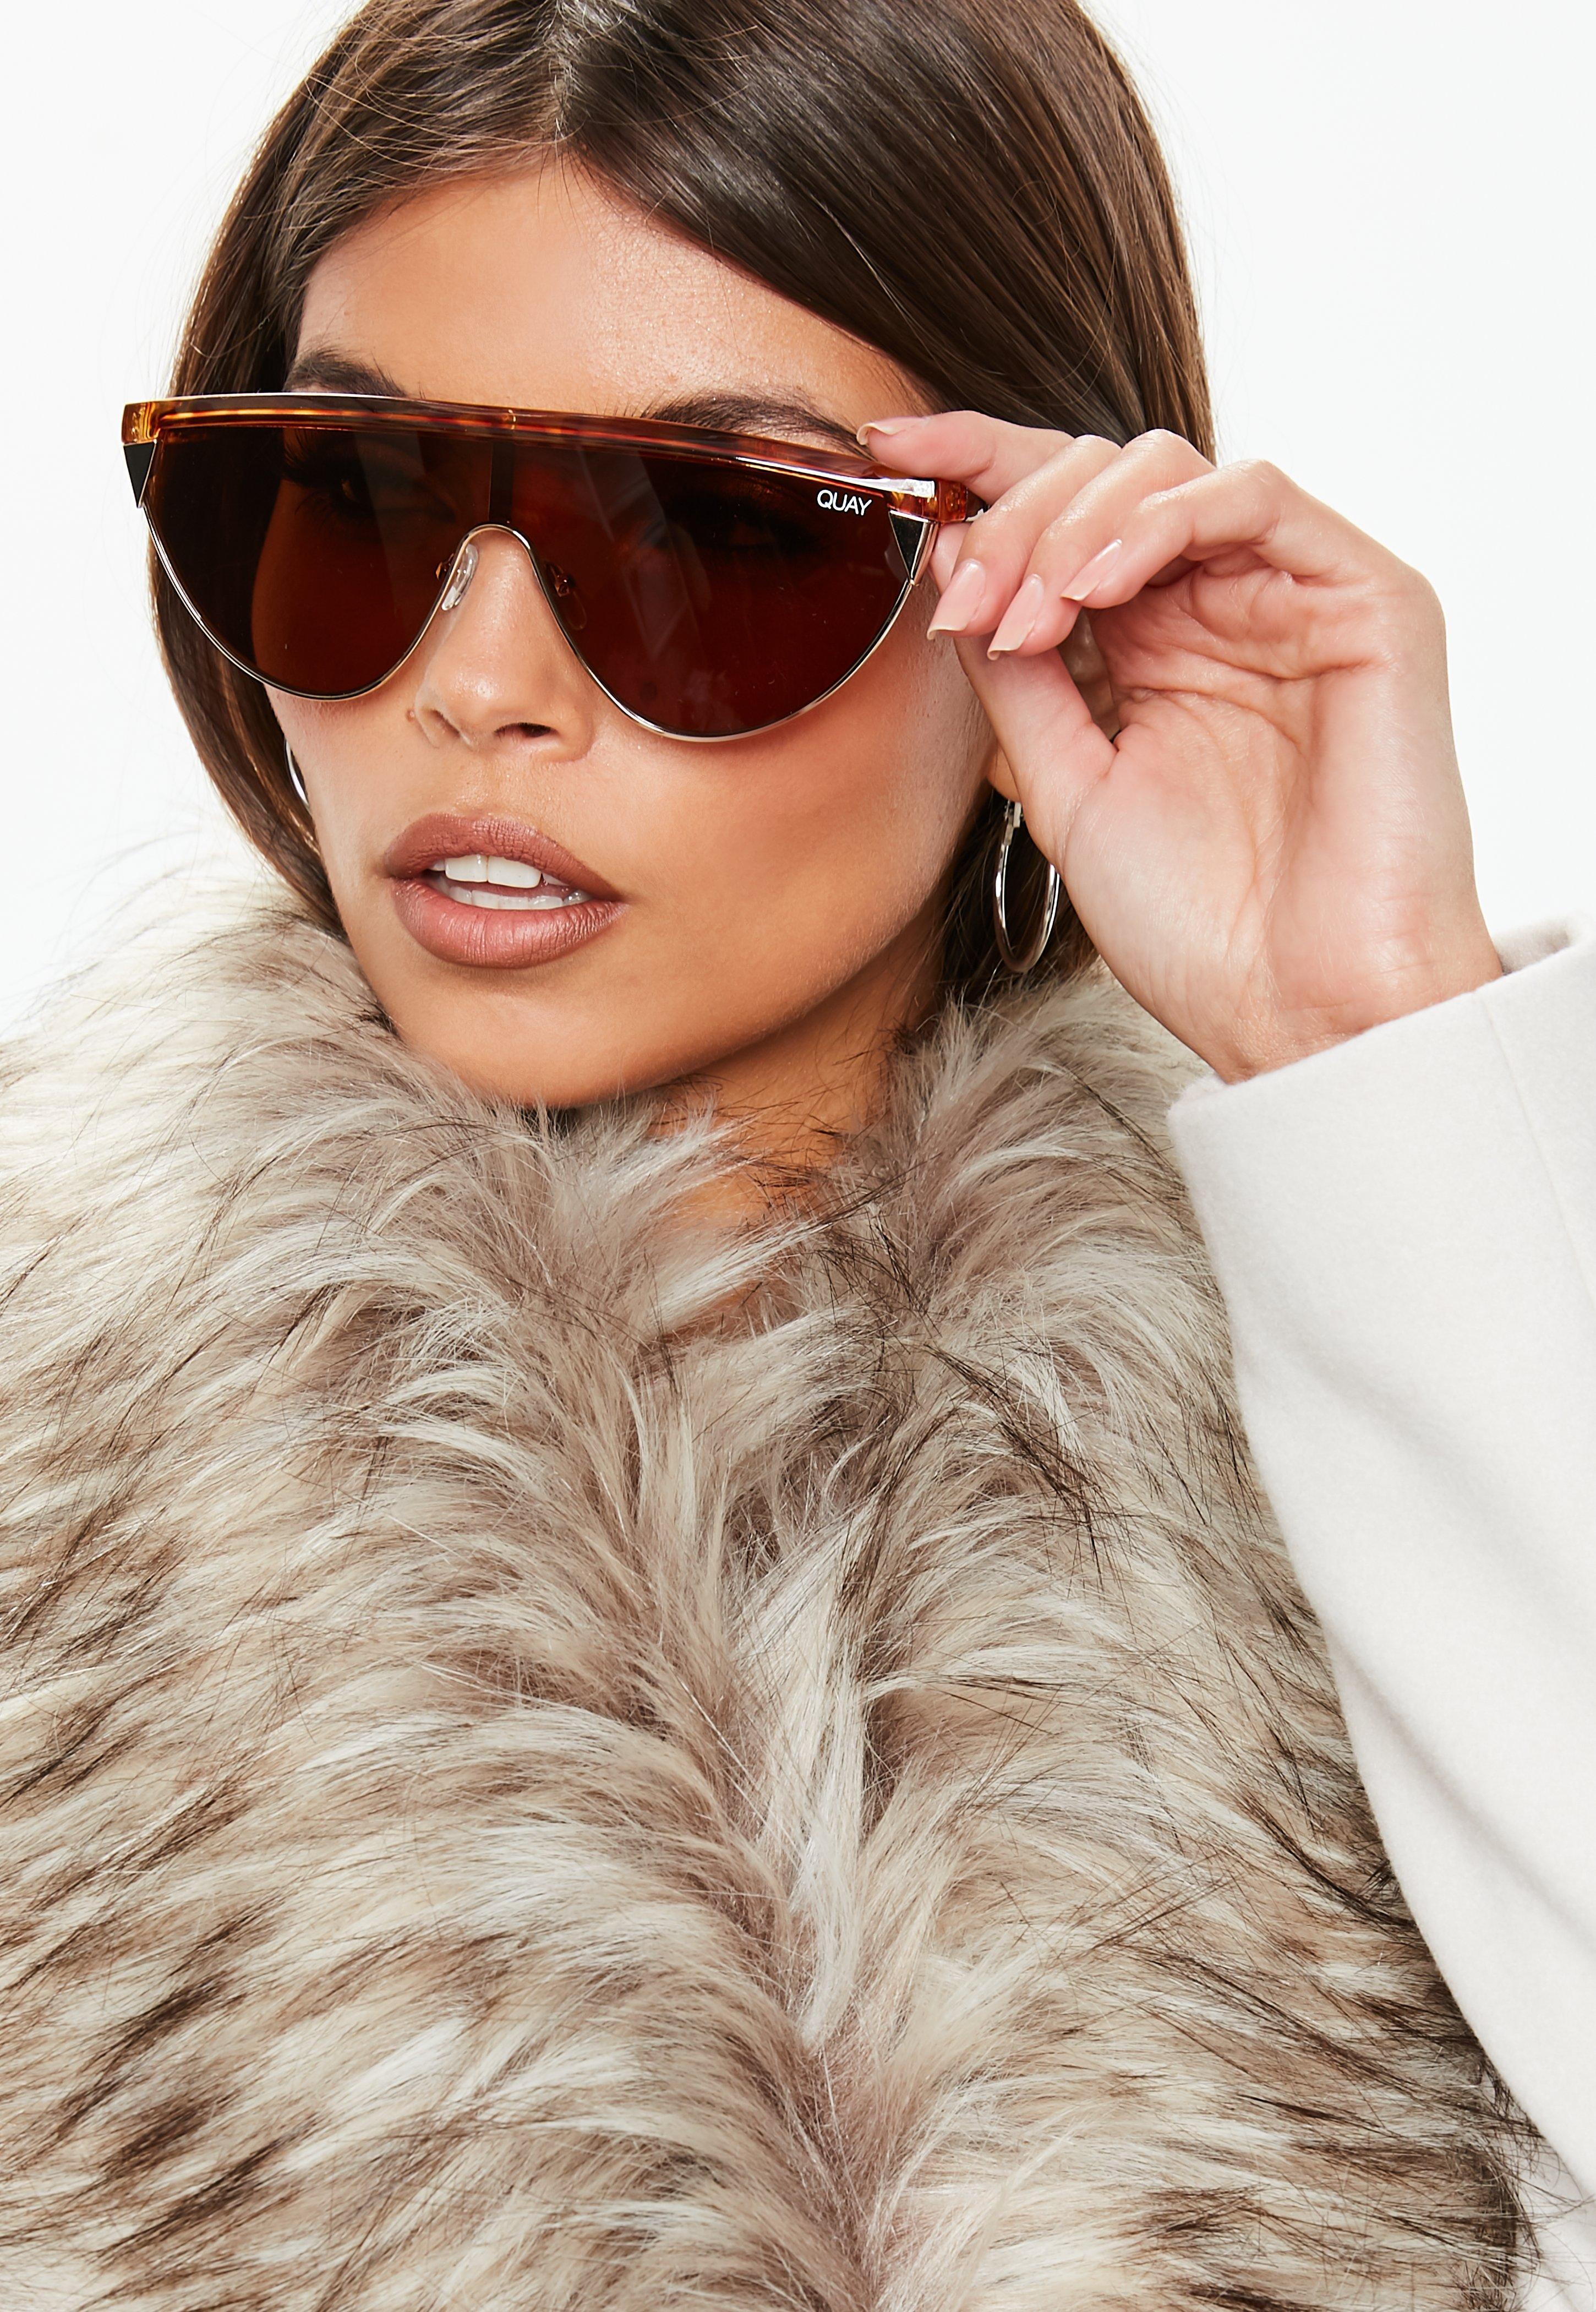 6feb5dbfea Quay Australia X Elle Ferguson Goldie Tortoiseshell Sunglasses ...